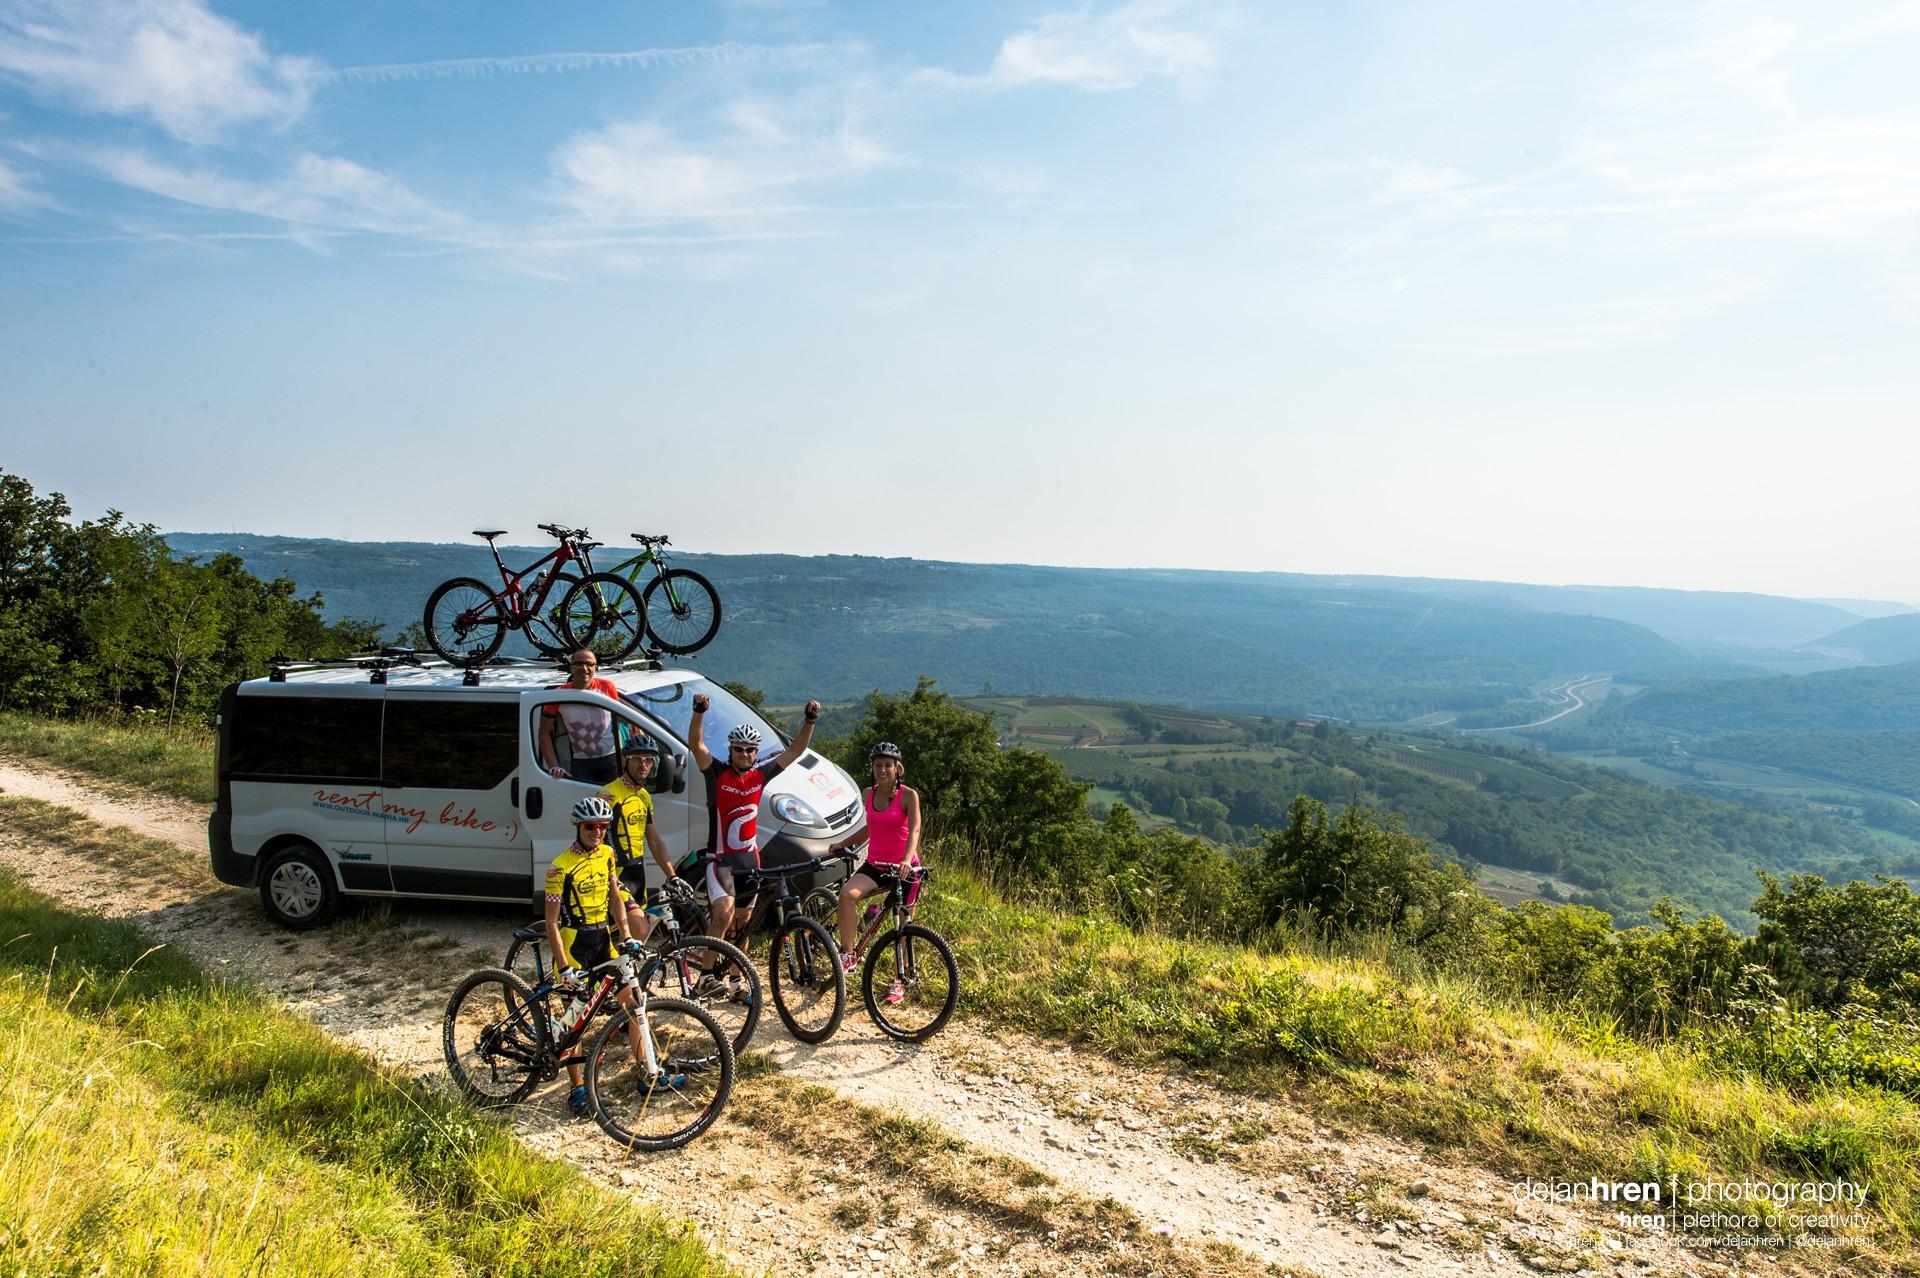 More than just a regular bike tour 3